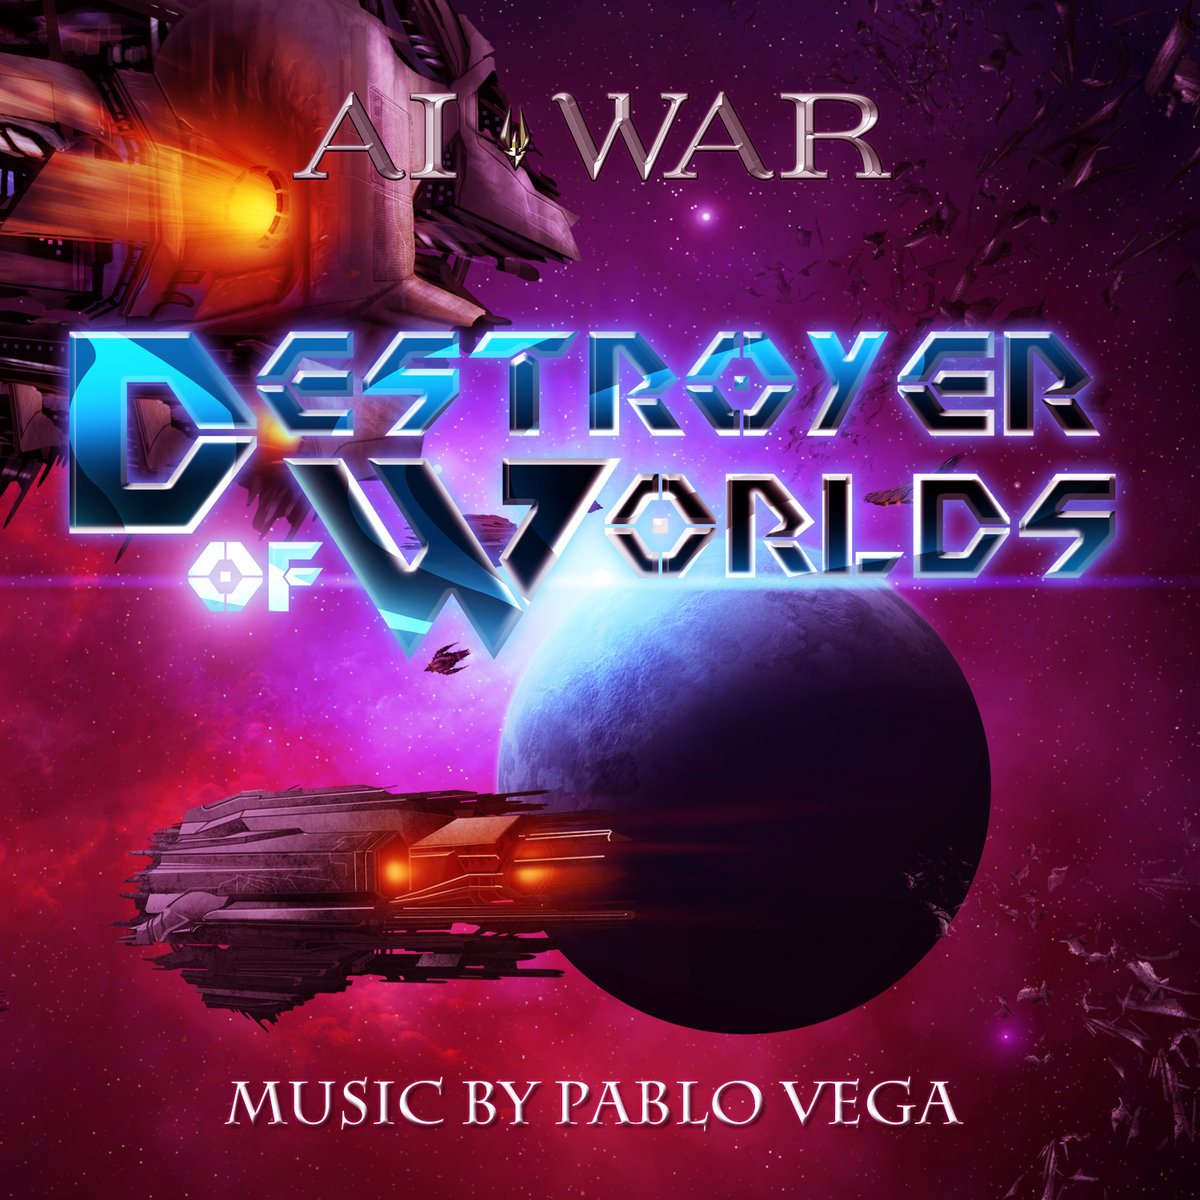 Ai War ai war: destroyer of worlds | pablo vega